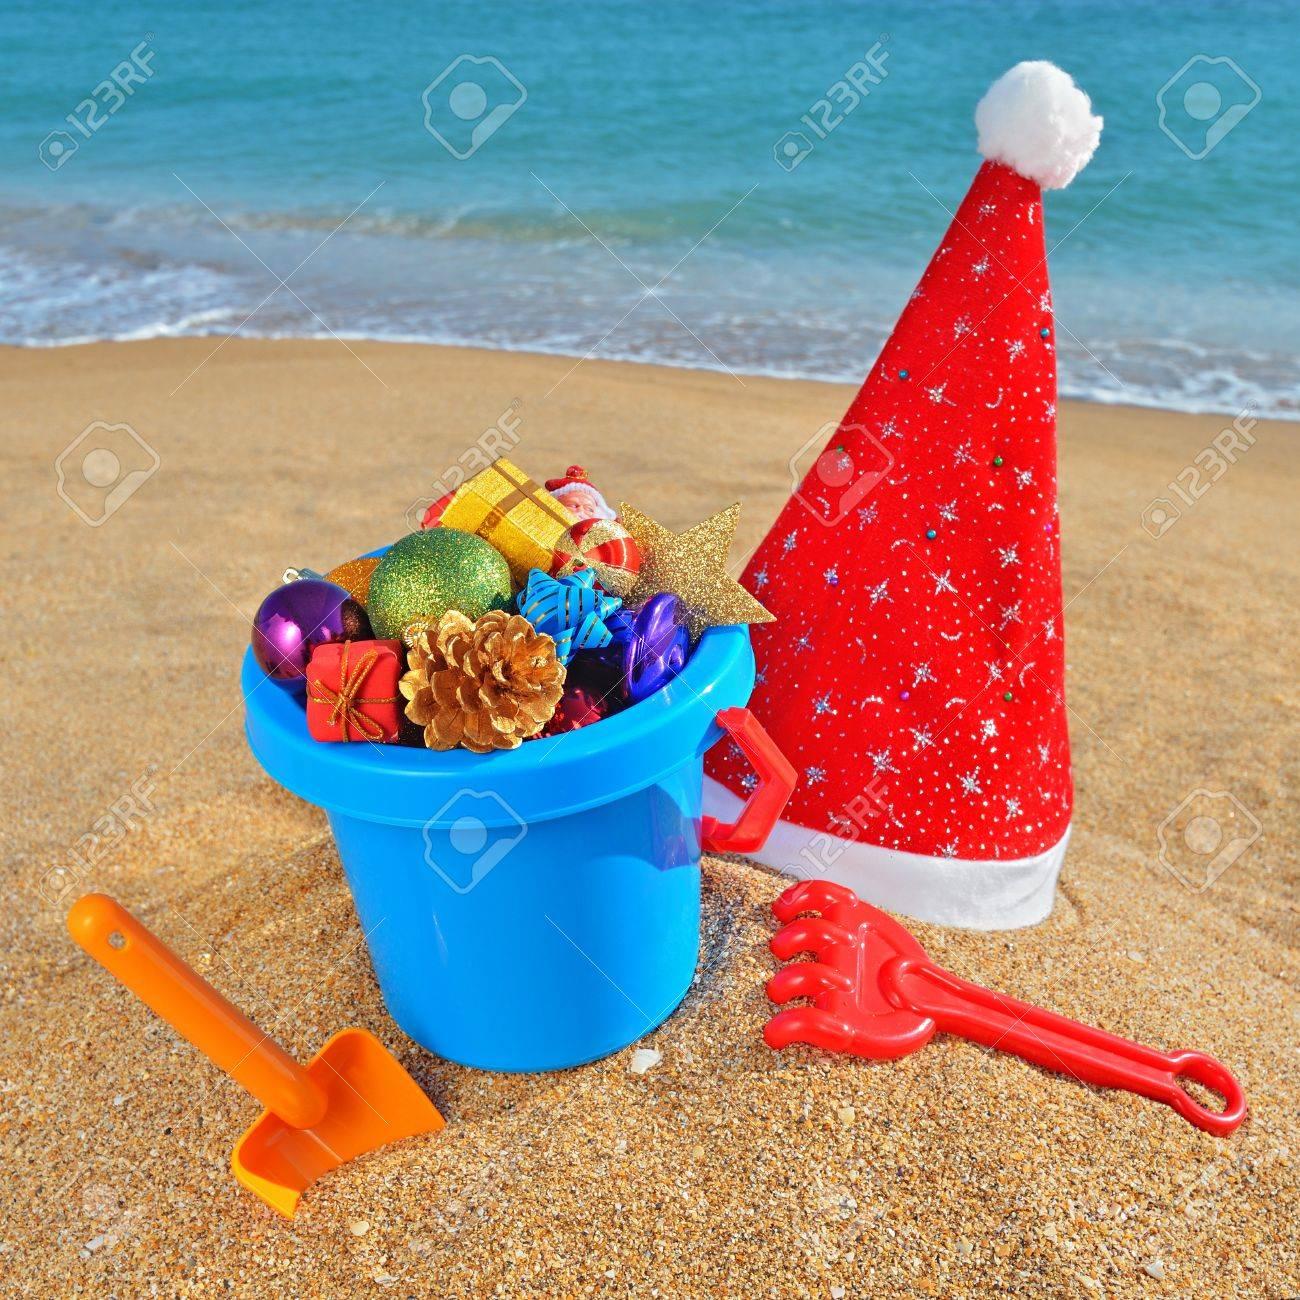 Christmas toys, decorations and Santa Claus cap on the beach against a blue ocean Stock Photo - 16167514